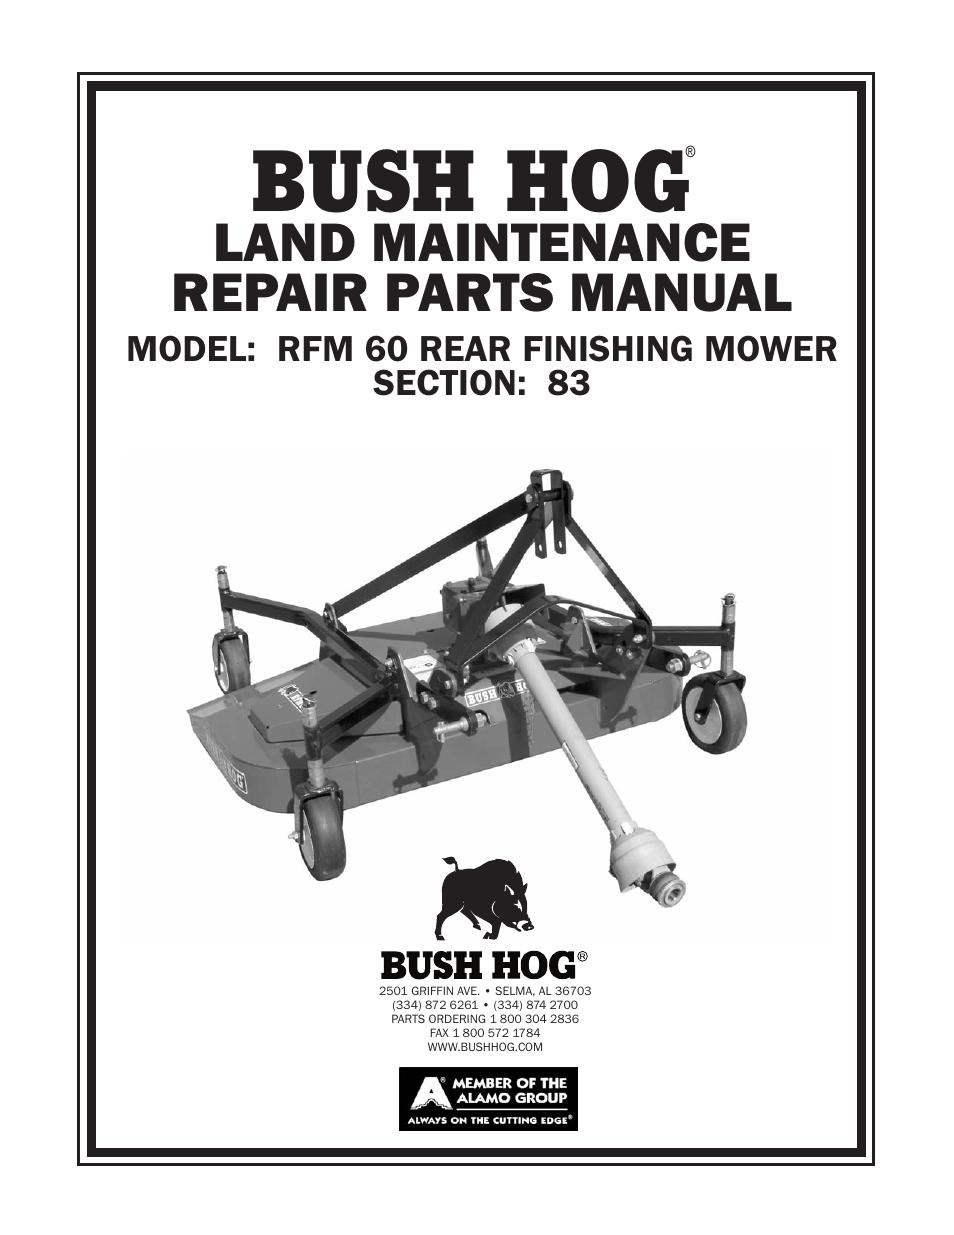 Bush Hog Mower Parts